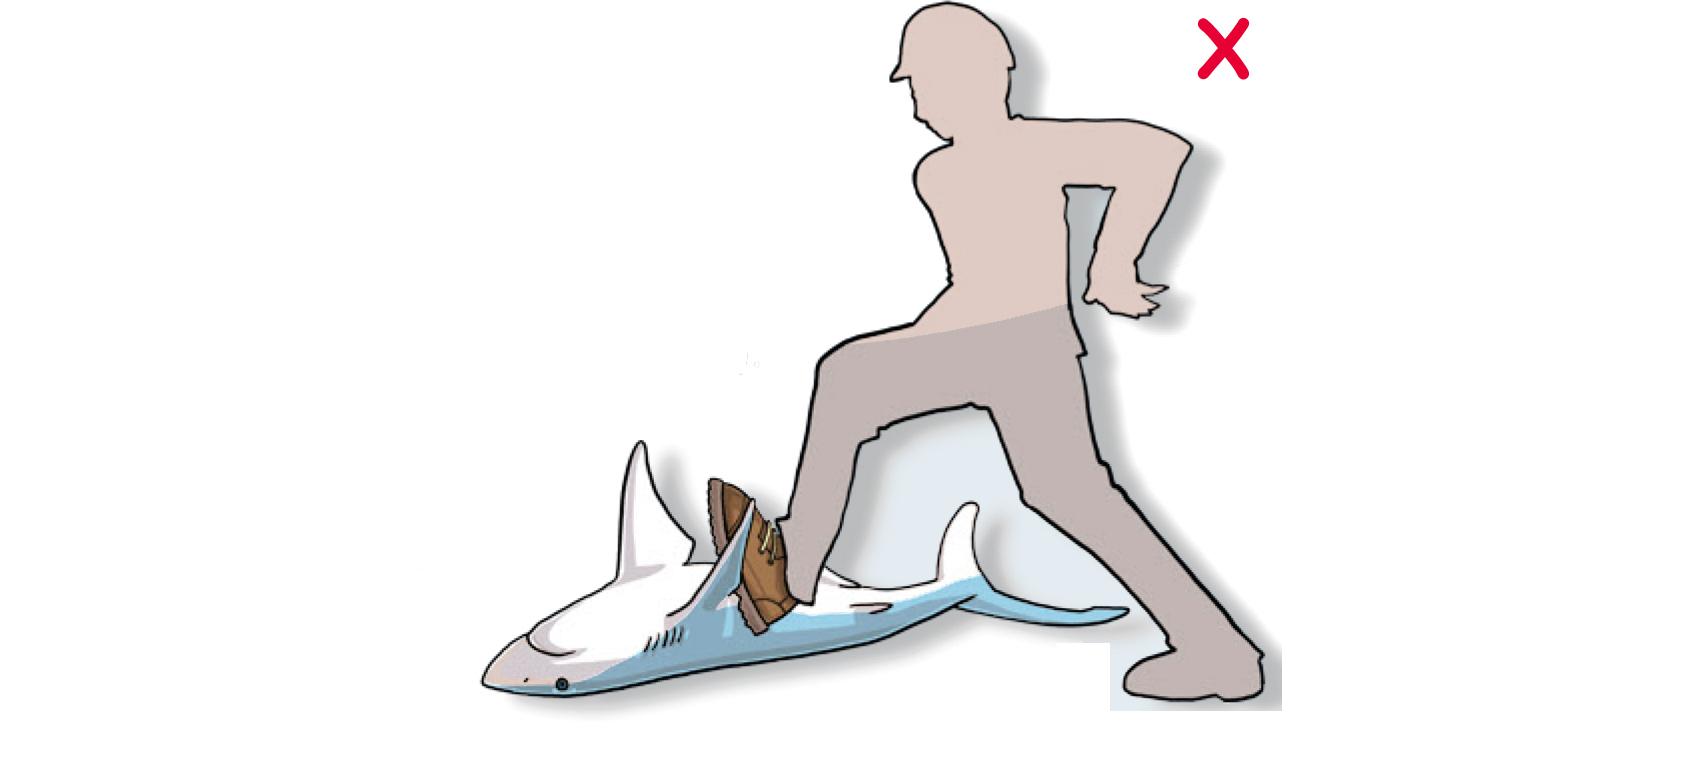 DO NOT yank or push the animal sharply. (Poisson et al, 2012)